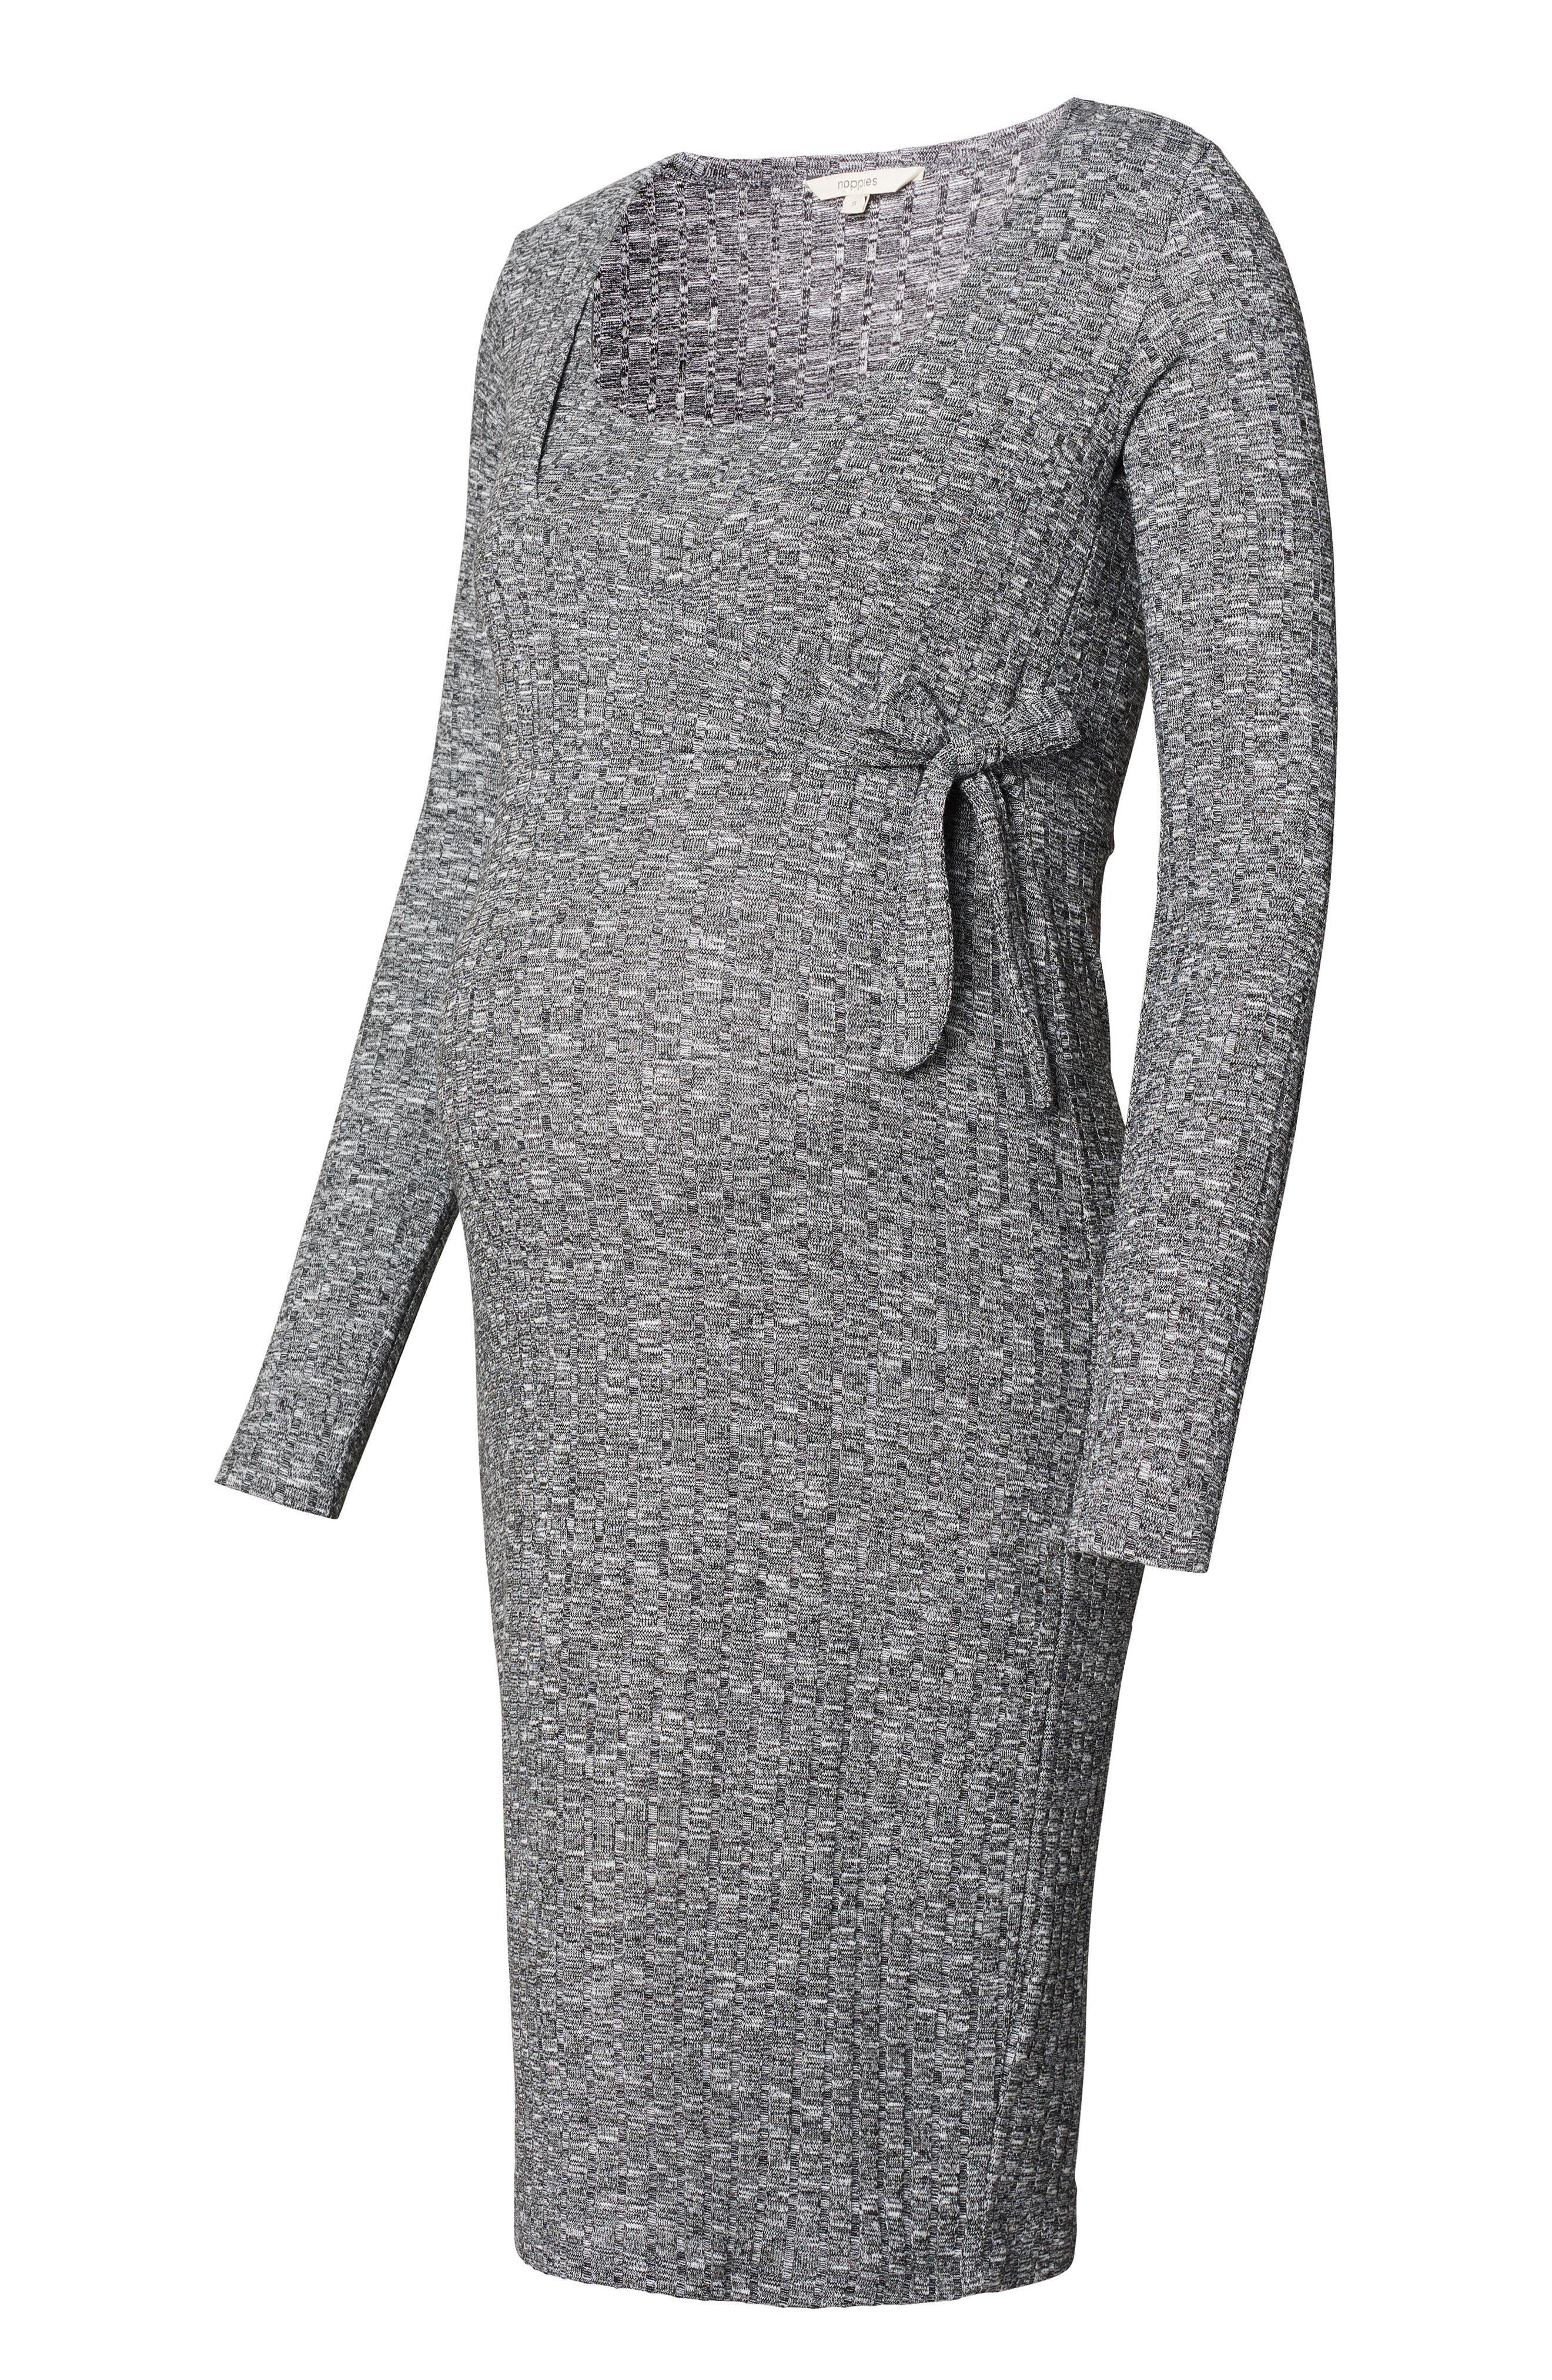 Giulia Maternity Sweater Dress,                             Alternate thumbnail 3, color,                             Anthracite Melange